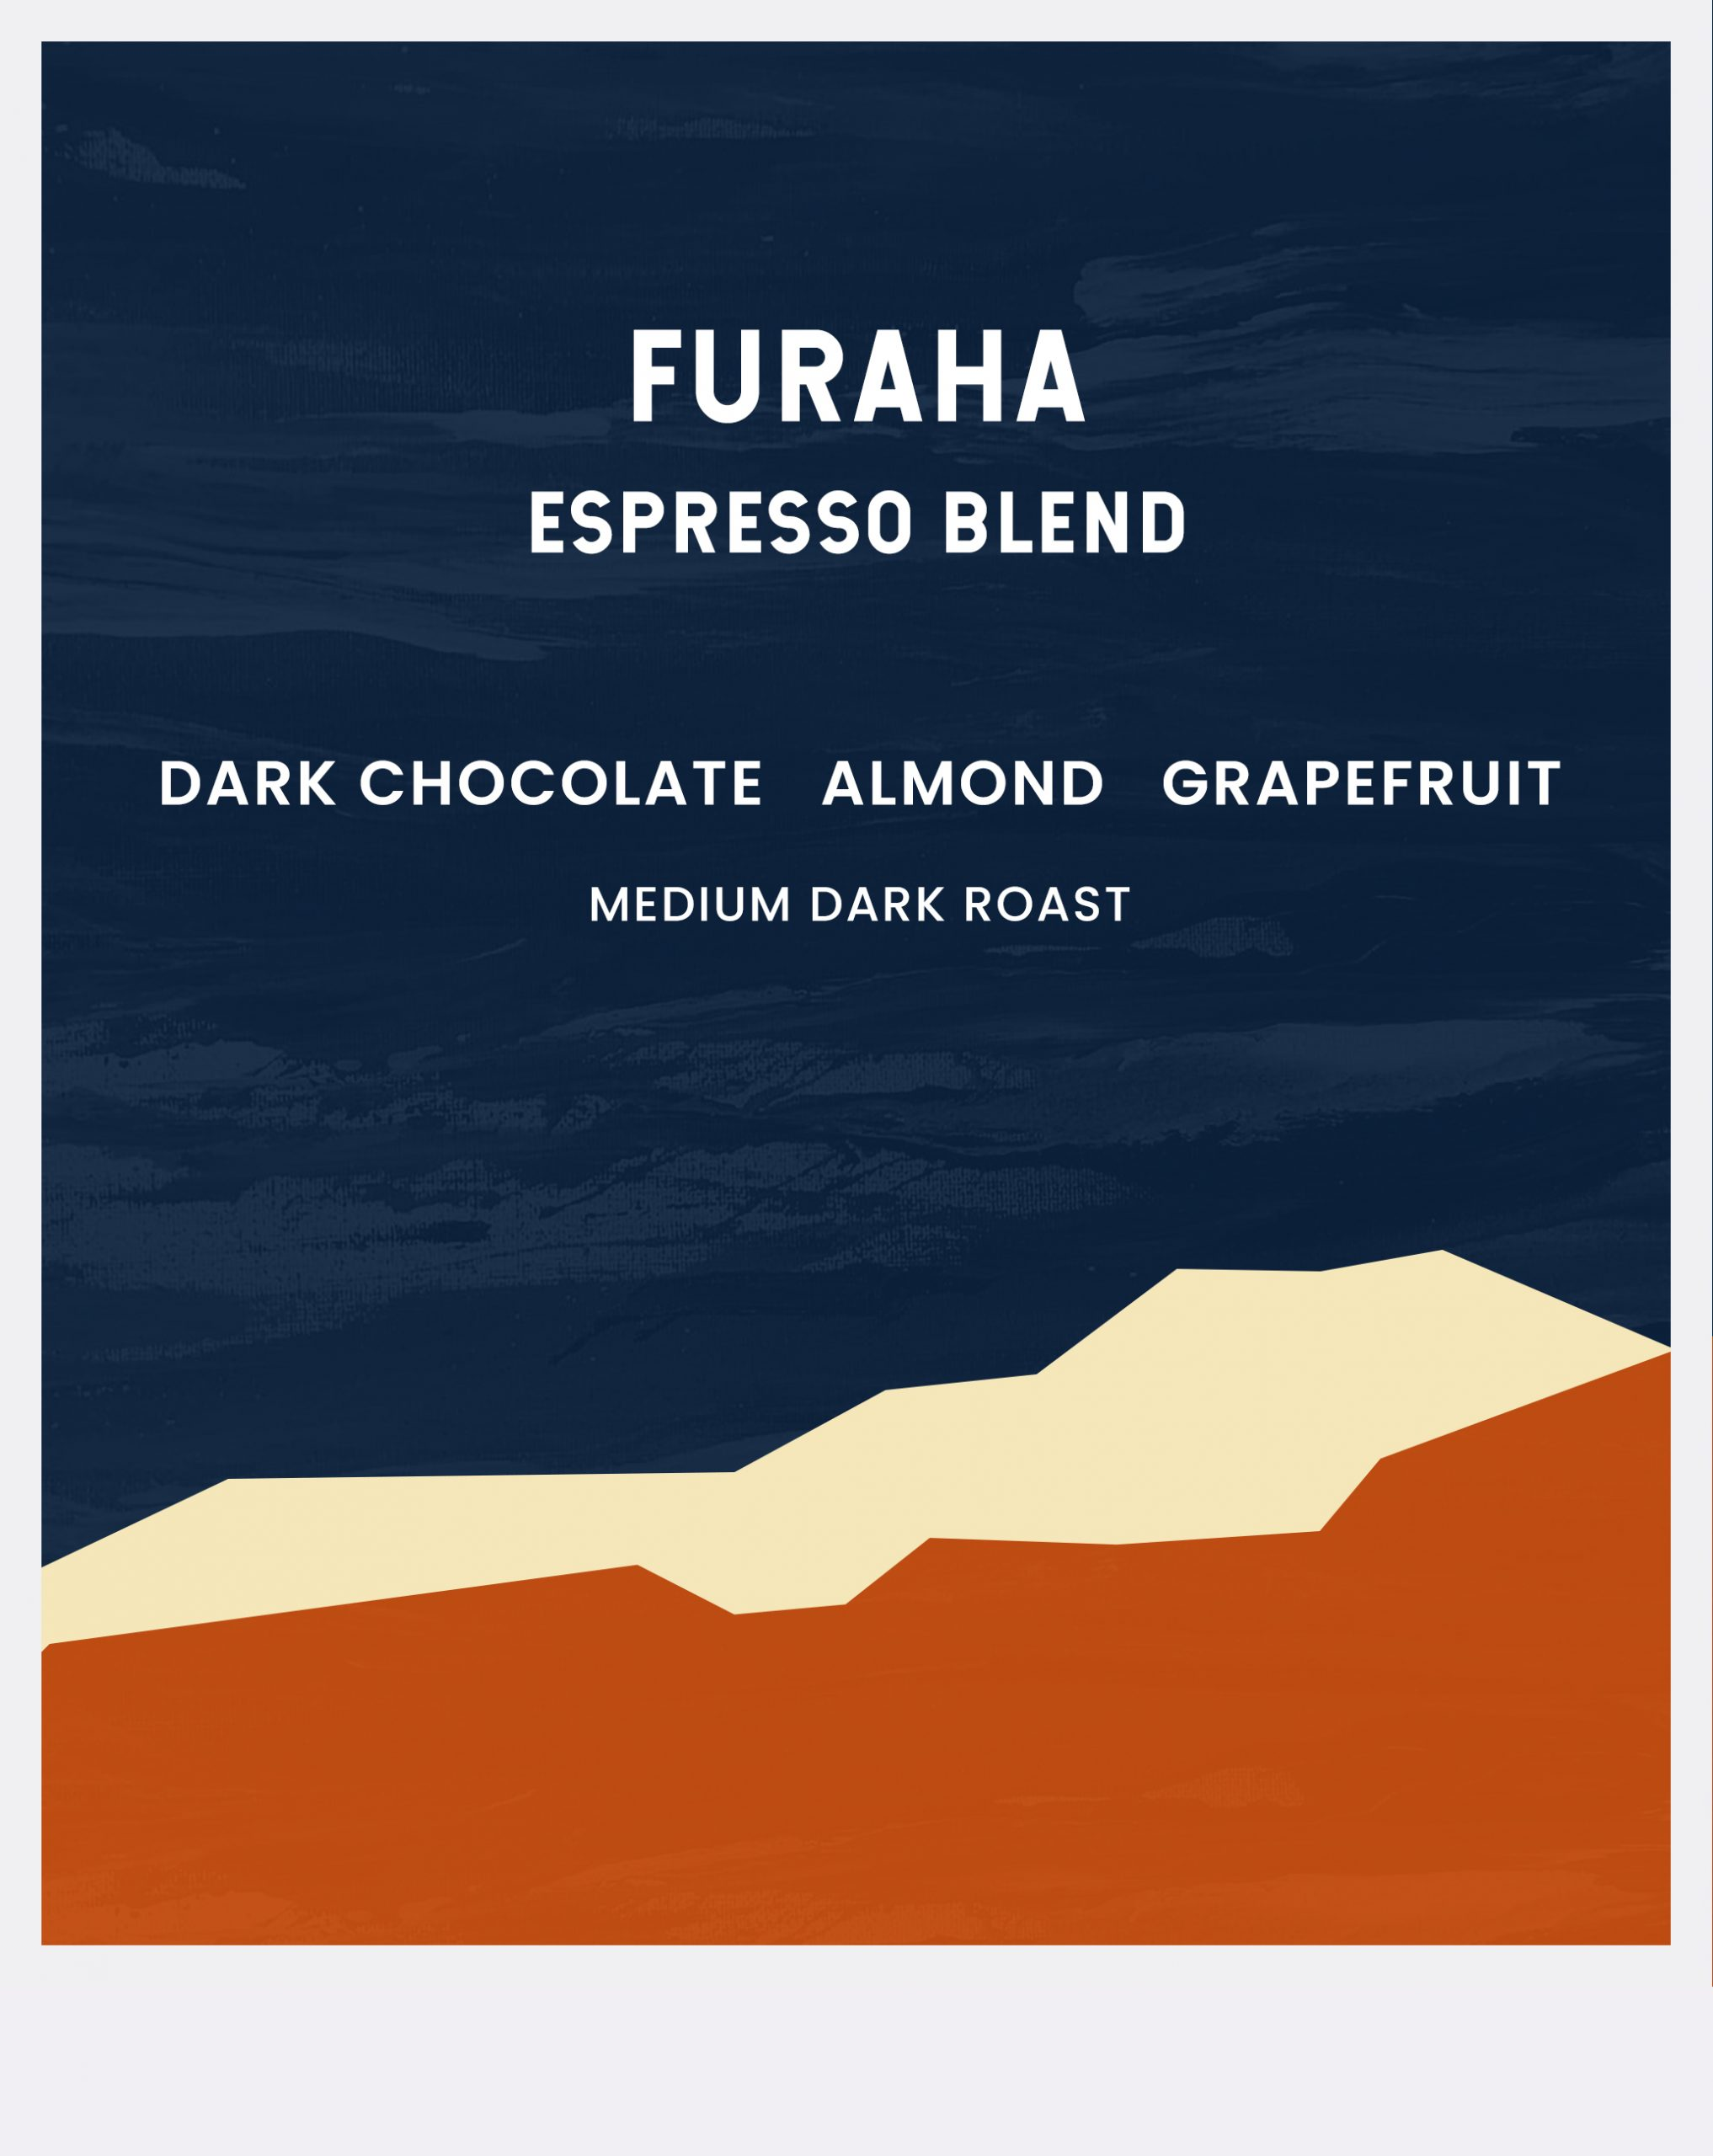 Furaha Label